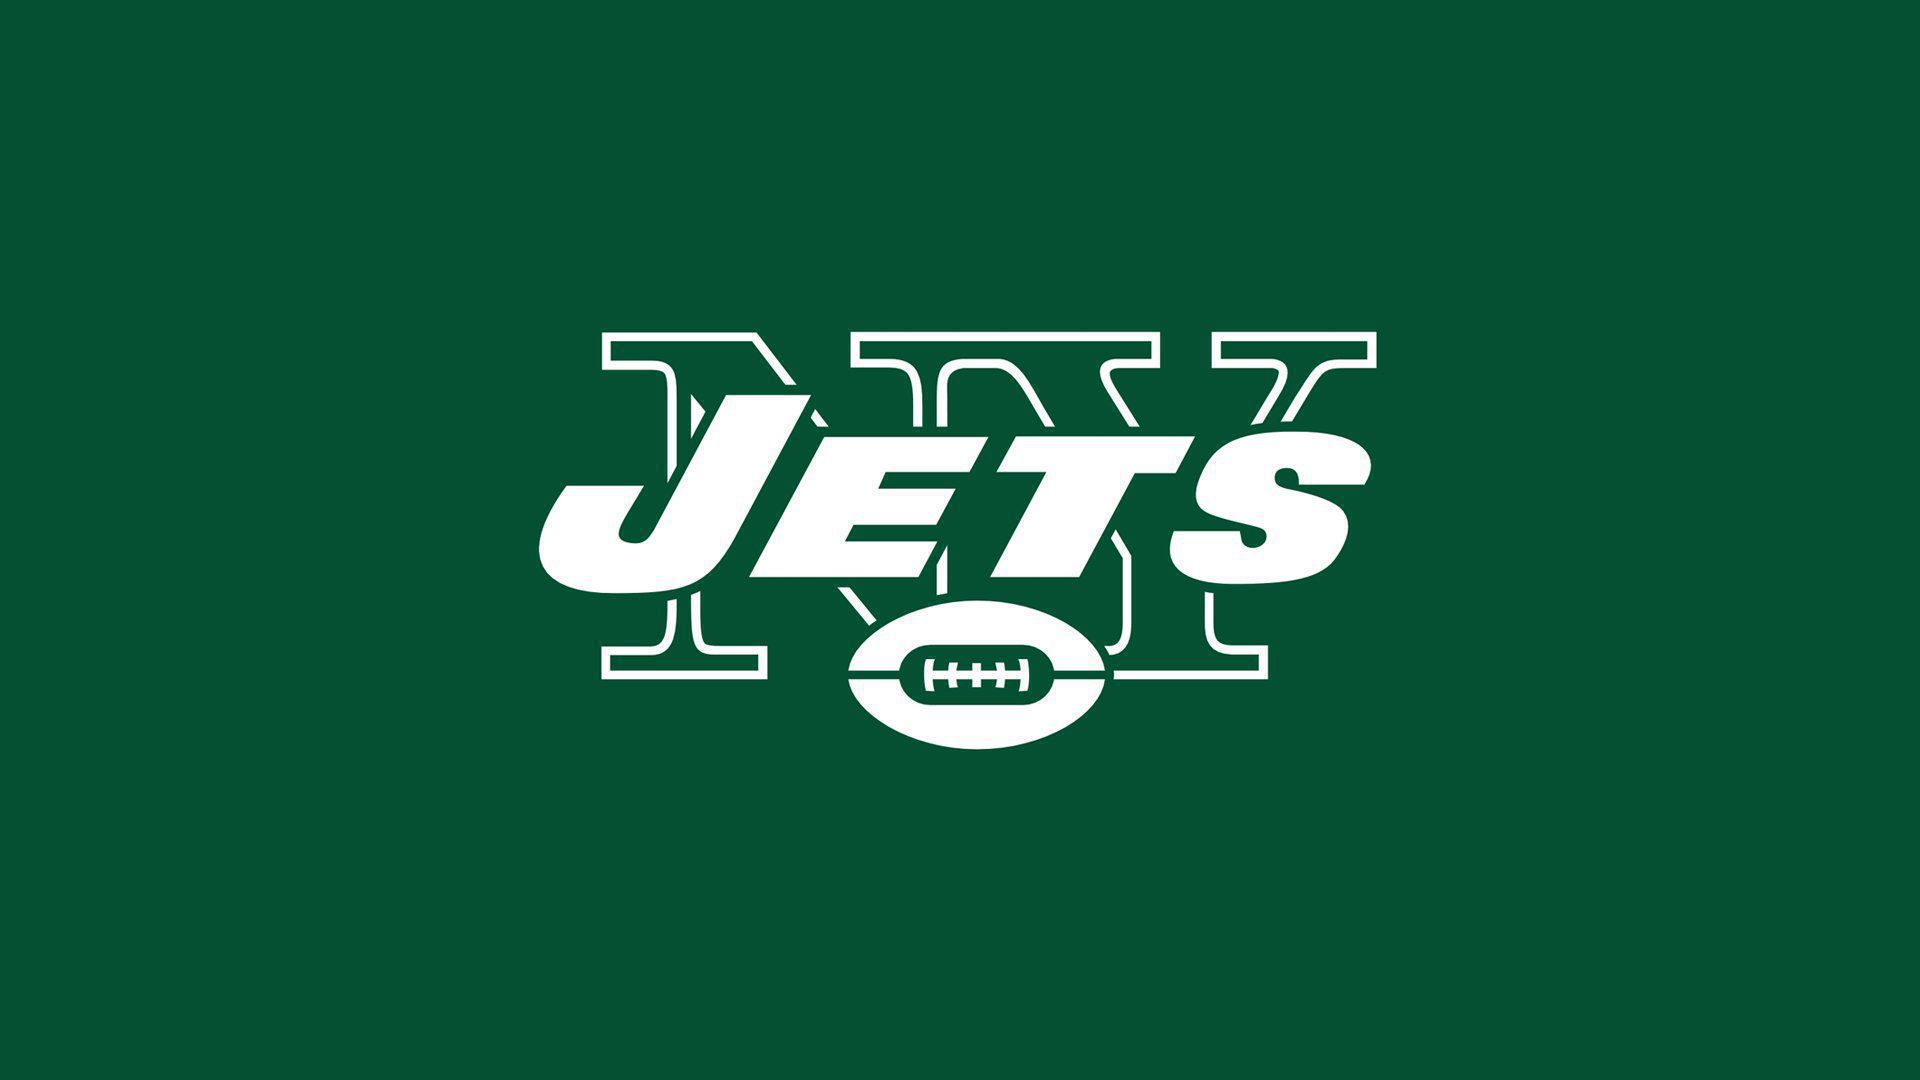 new york jets logo hd wallpaper 68434